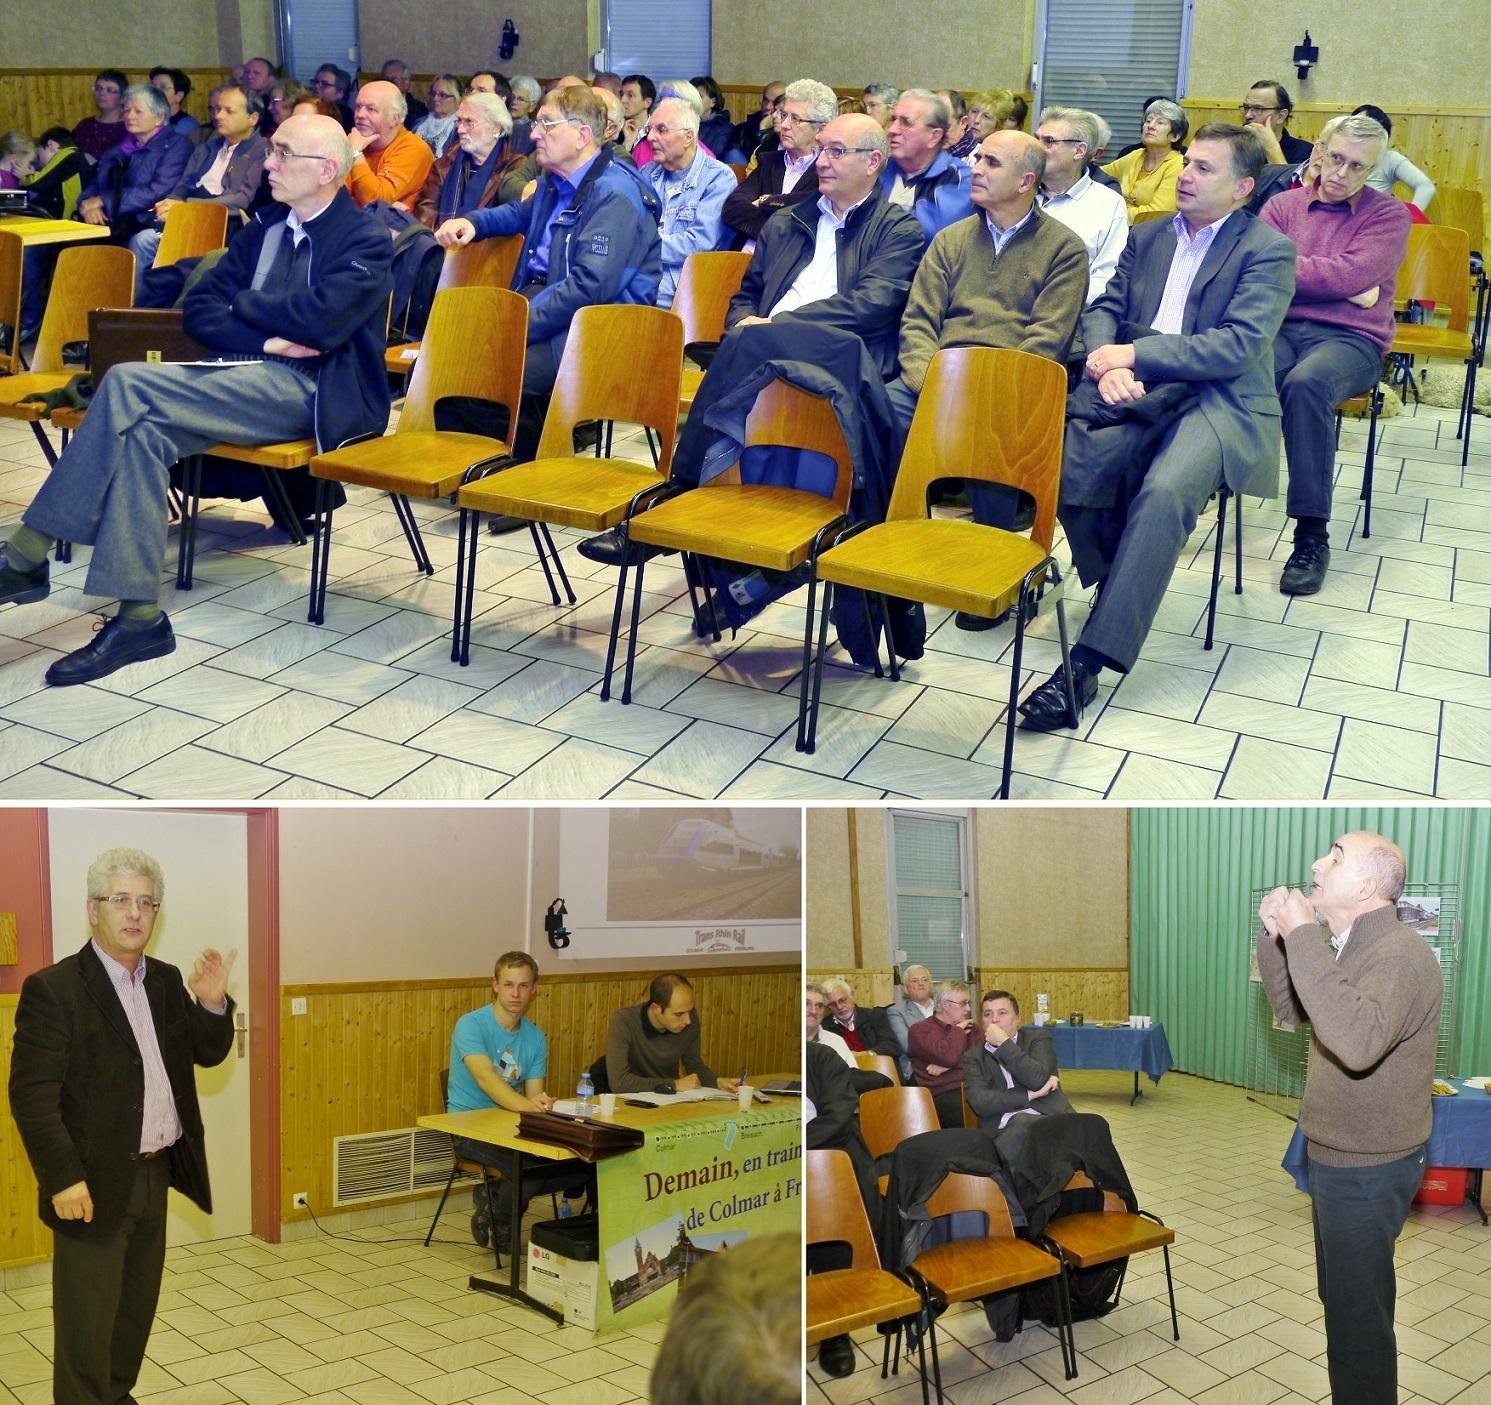 reunion-volgelsheim